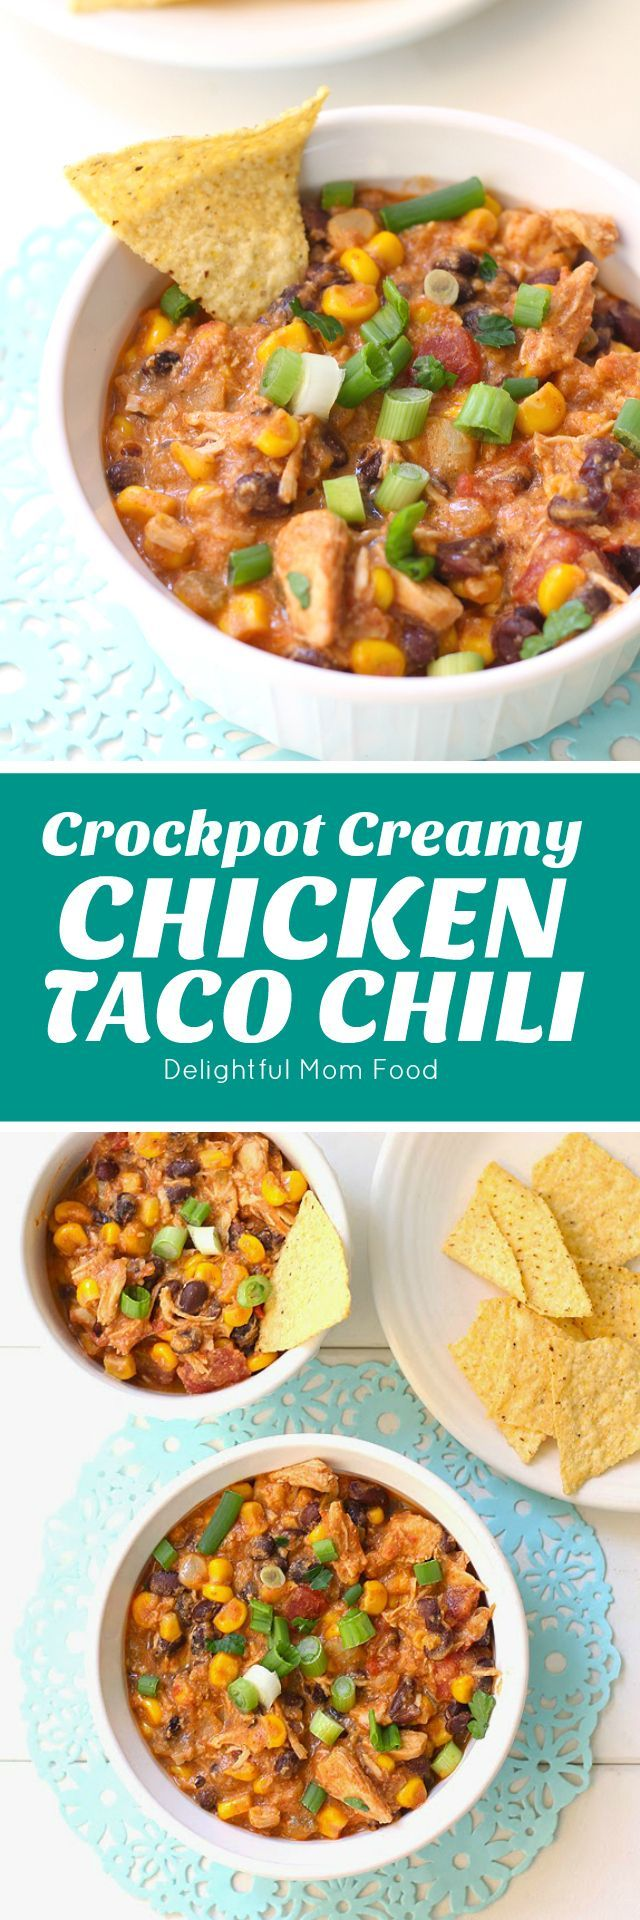 Crockpot Creamy Chicken Taco Chili.